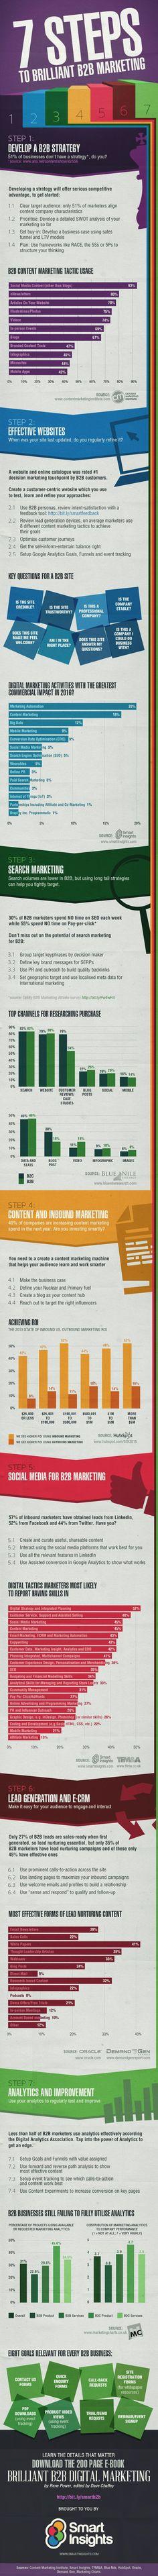 7 Steps to Brilliant B2B Digital Marketing 2015